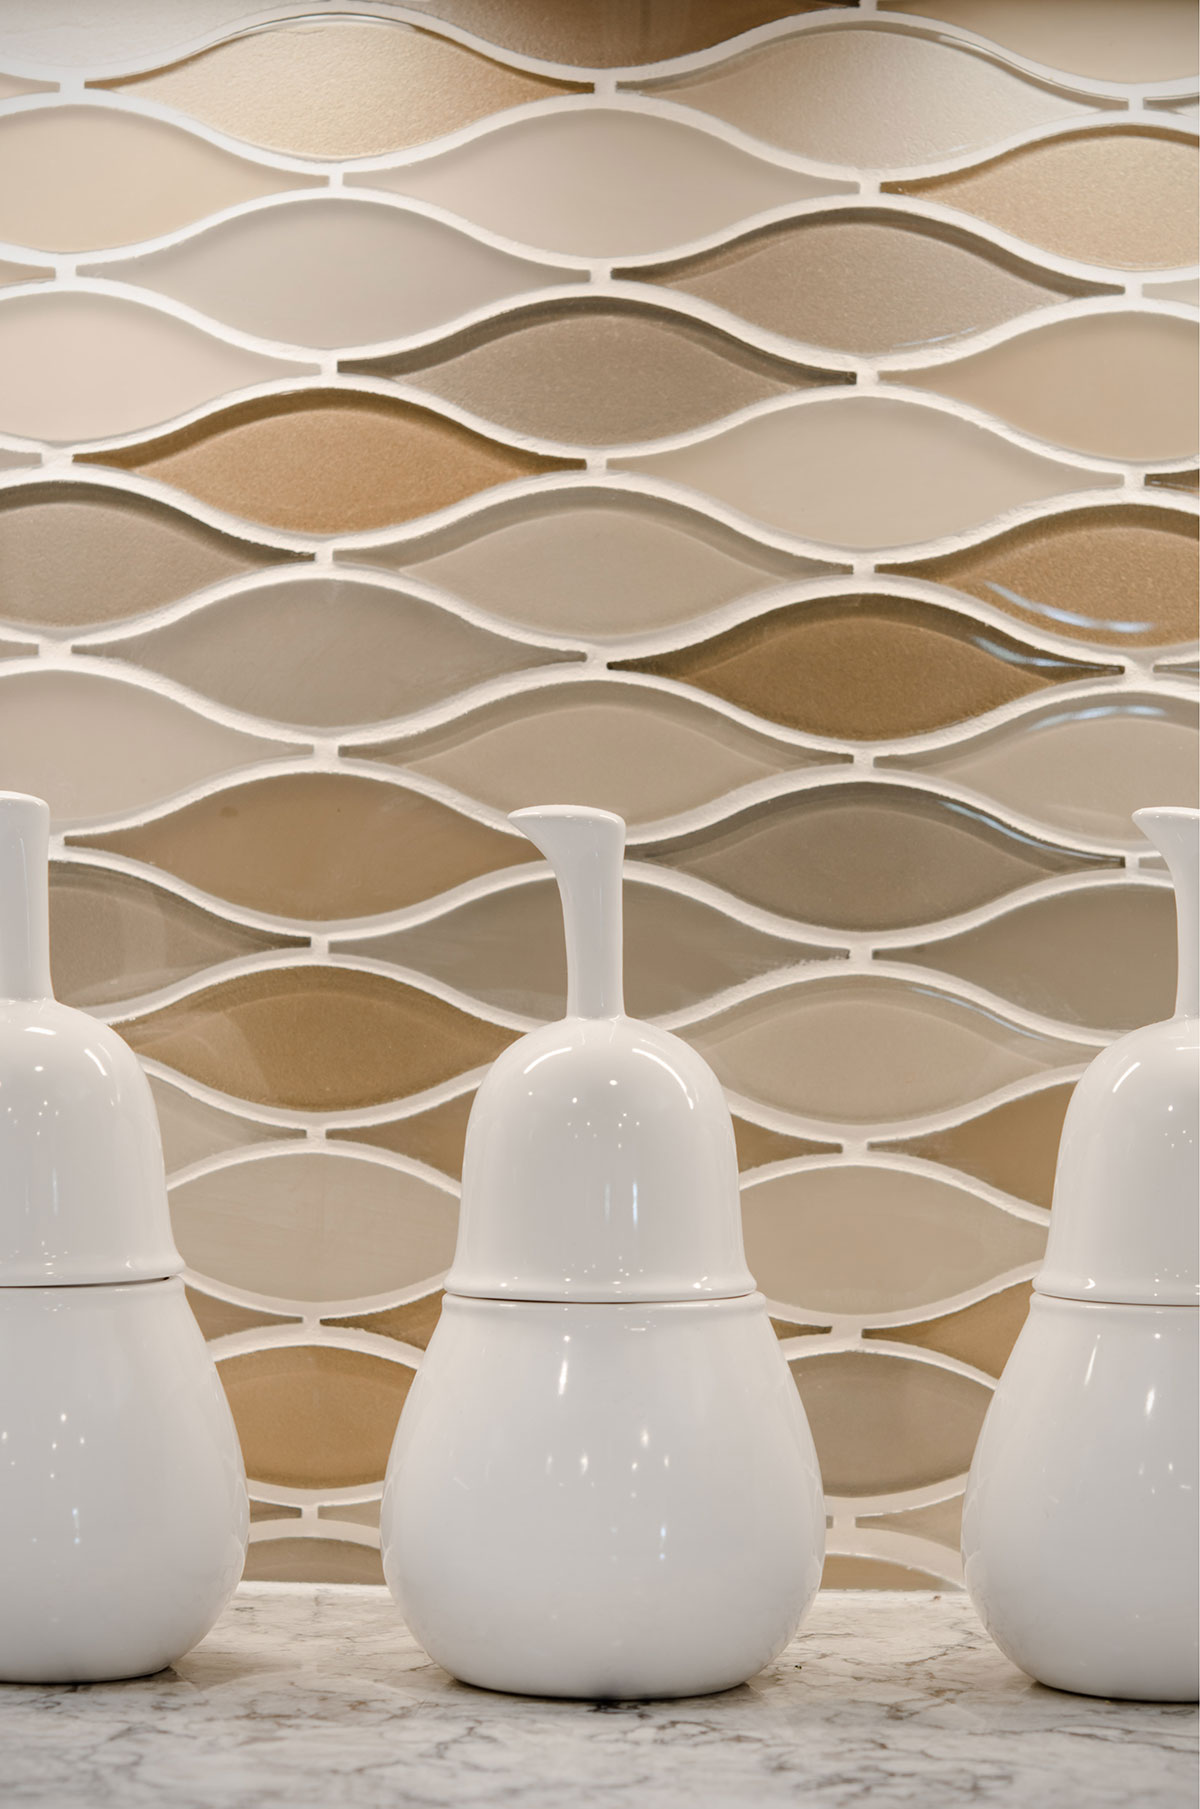 Braintree, MA custom glass backsplash by Susan Curtis Interiors